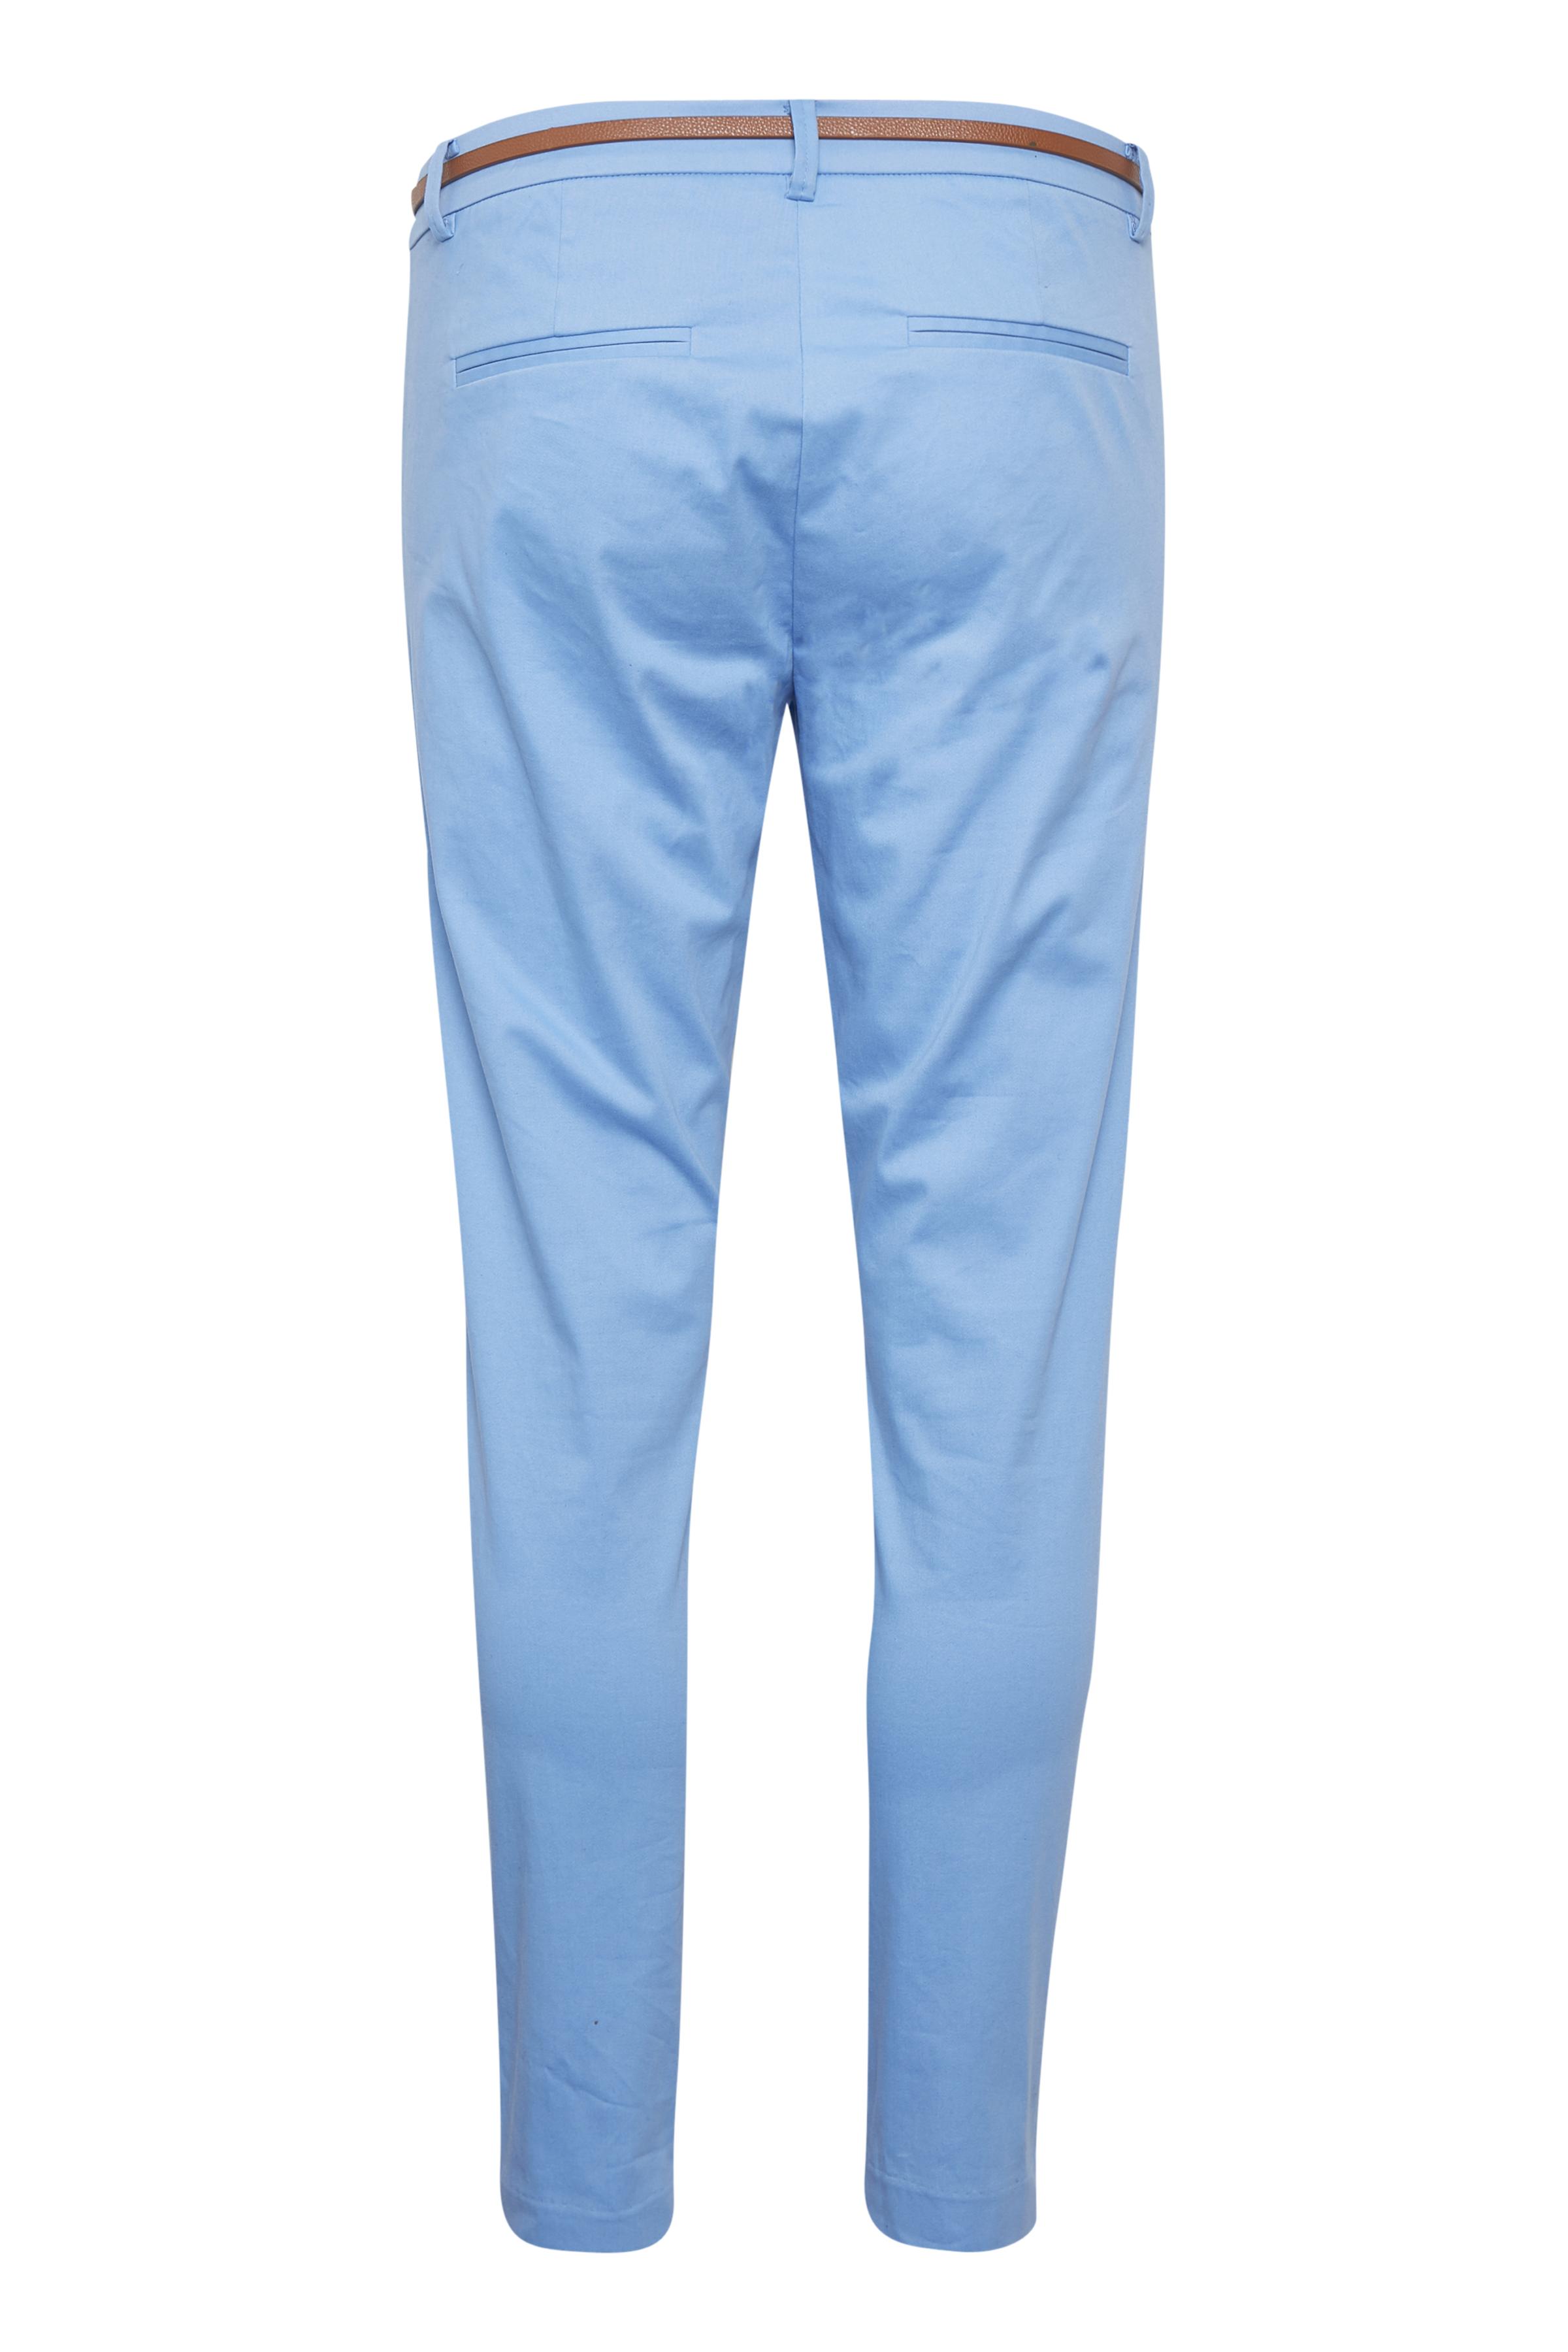 Cornflower Blue Pants Suiting von b.young – Kaufen Sie Cornflower Blue Pants Suiting aus Größe 34-46 hier